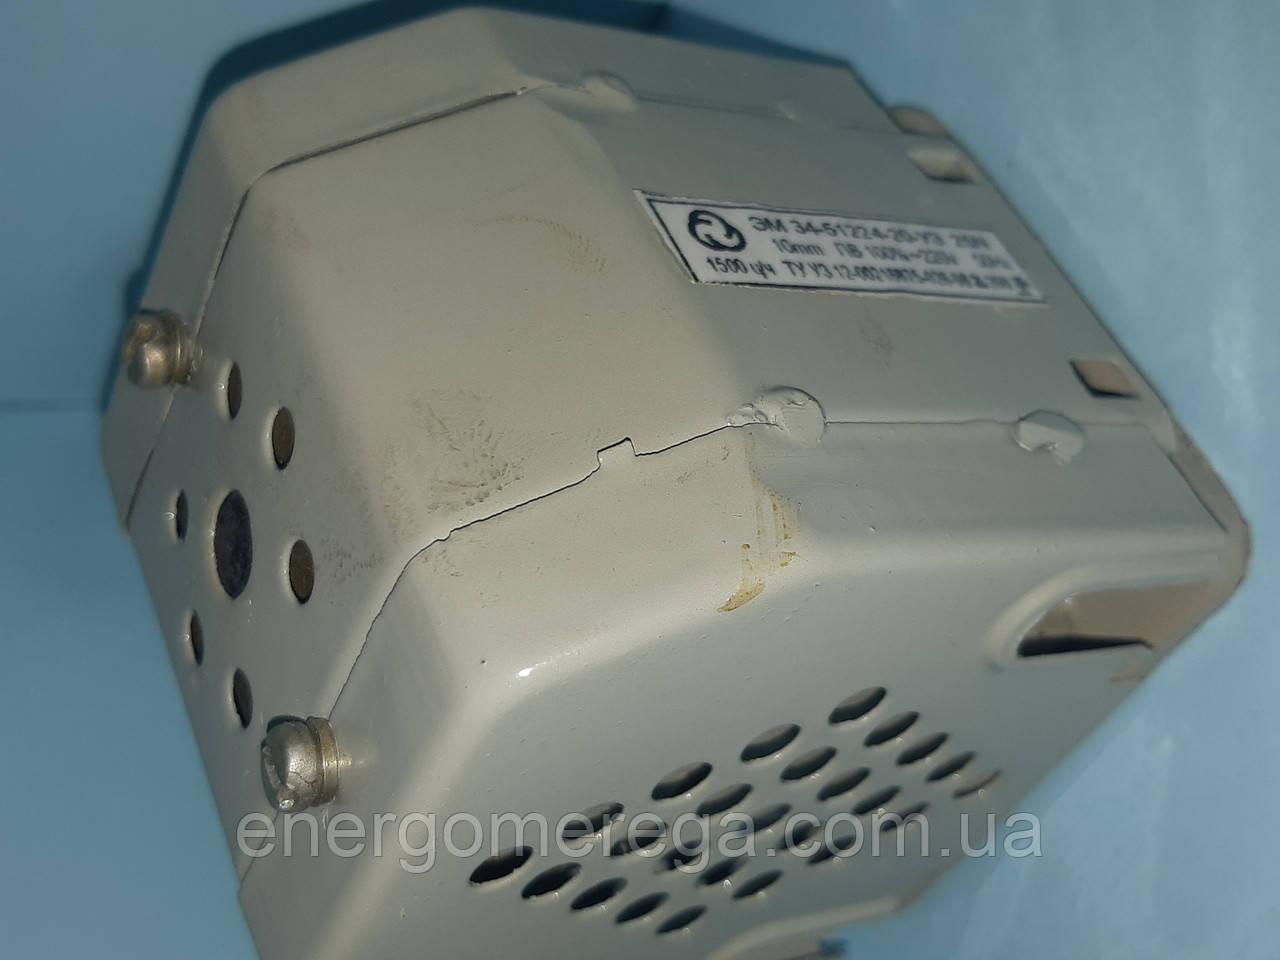 Электромагнит ЭМ 34-51261 220В